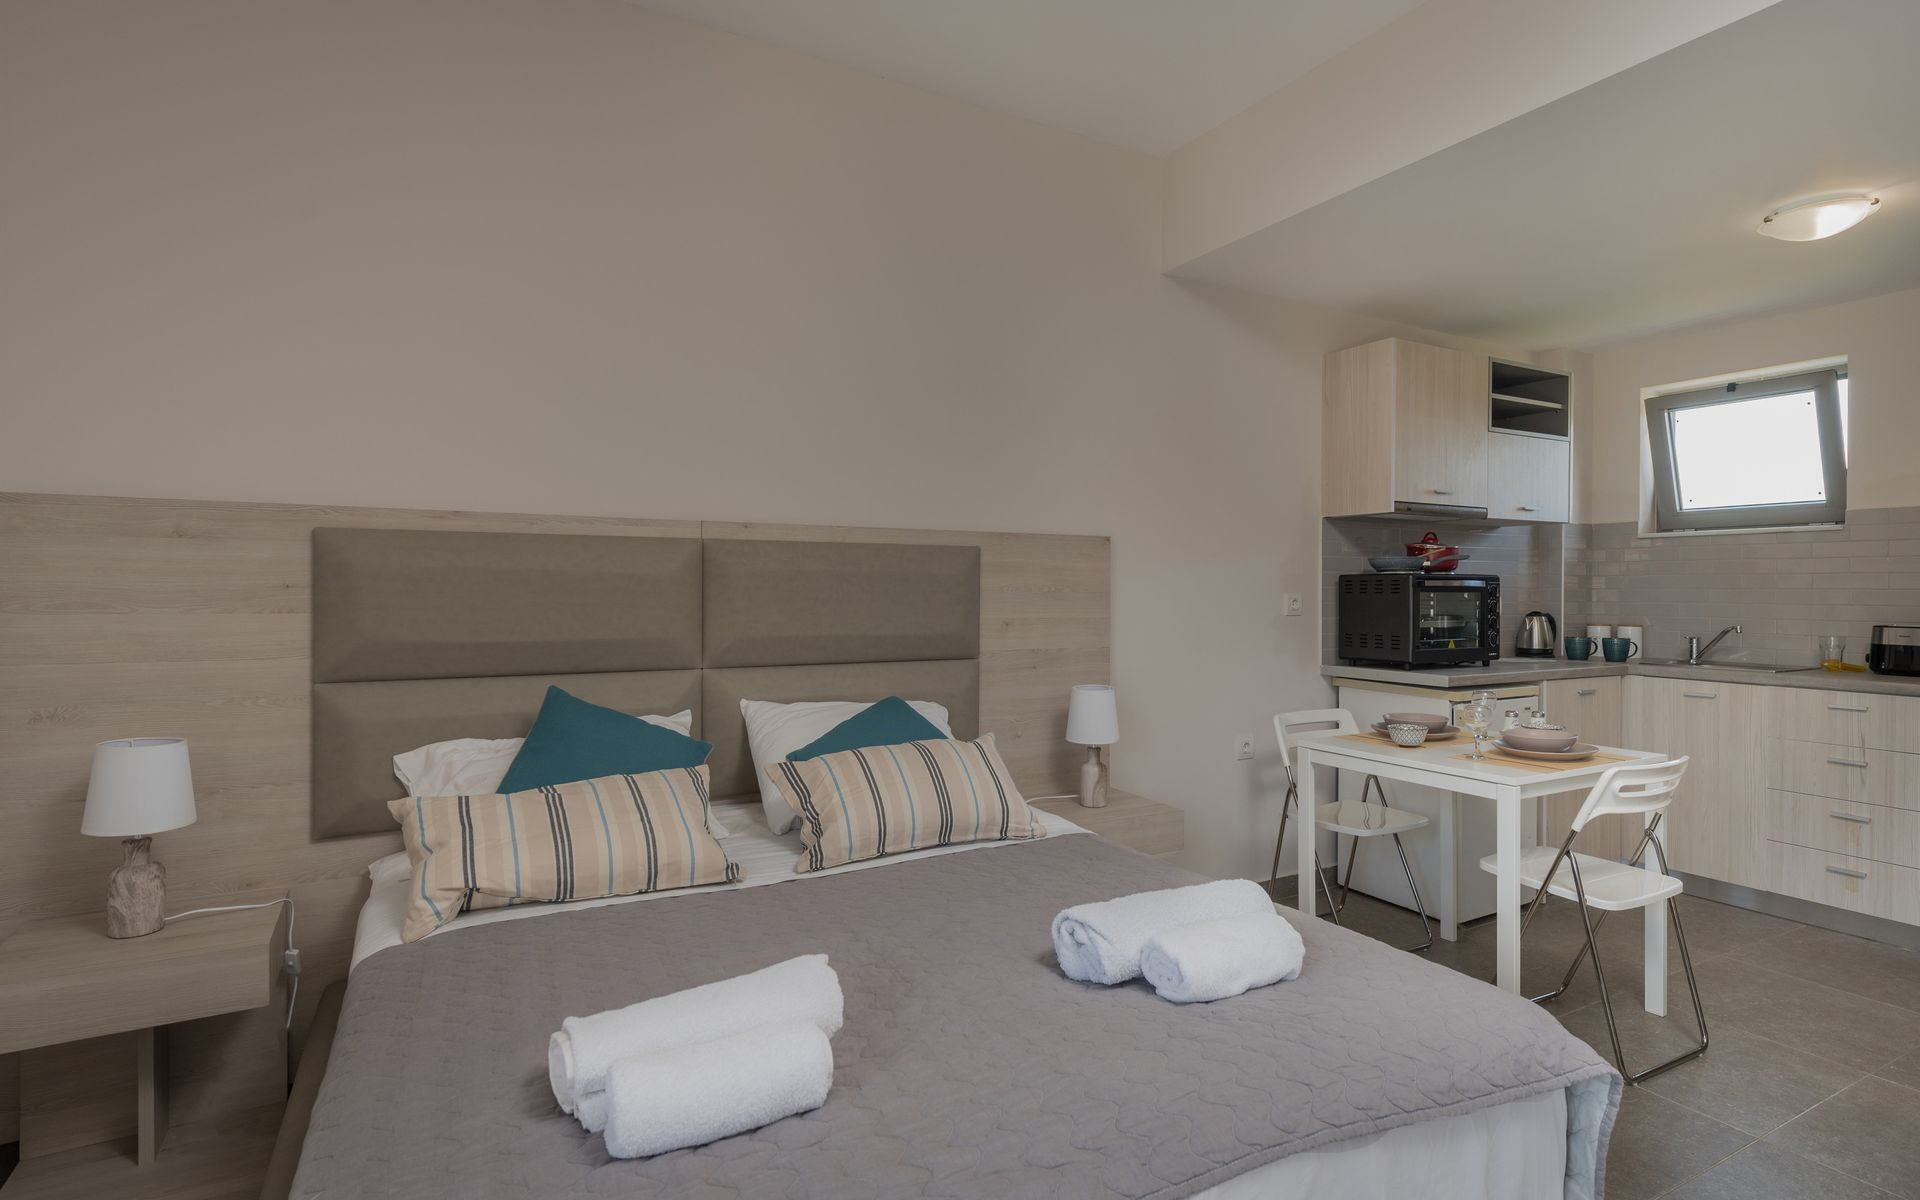 Casa 77 Zante by Karras Hotels - Ζάκυνθος ✦ 2 Ημέρες (1 Διανυκτέρευση) ✦ 2 άτομα ✦ Χωρίς Πρωινό ✦ 01/06/2021 έως 30/06/2021 ✦ Υπέροχη Τοποθεσία!